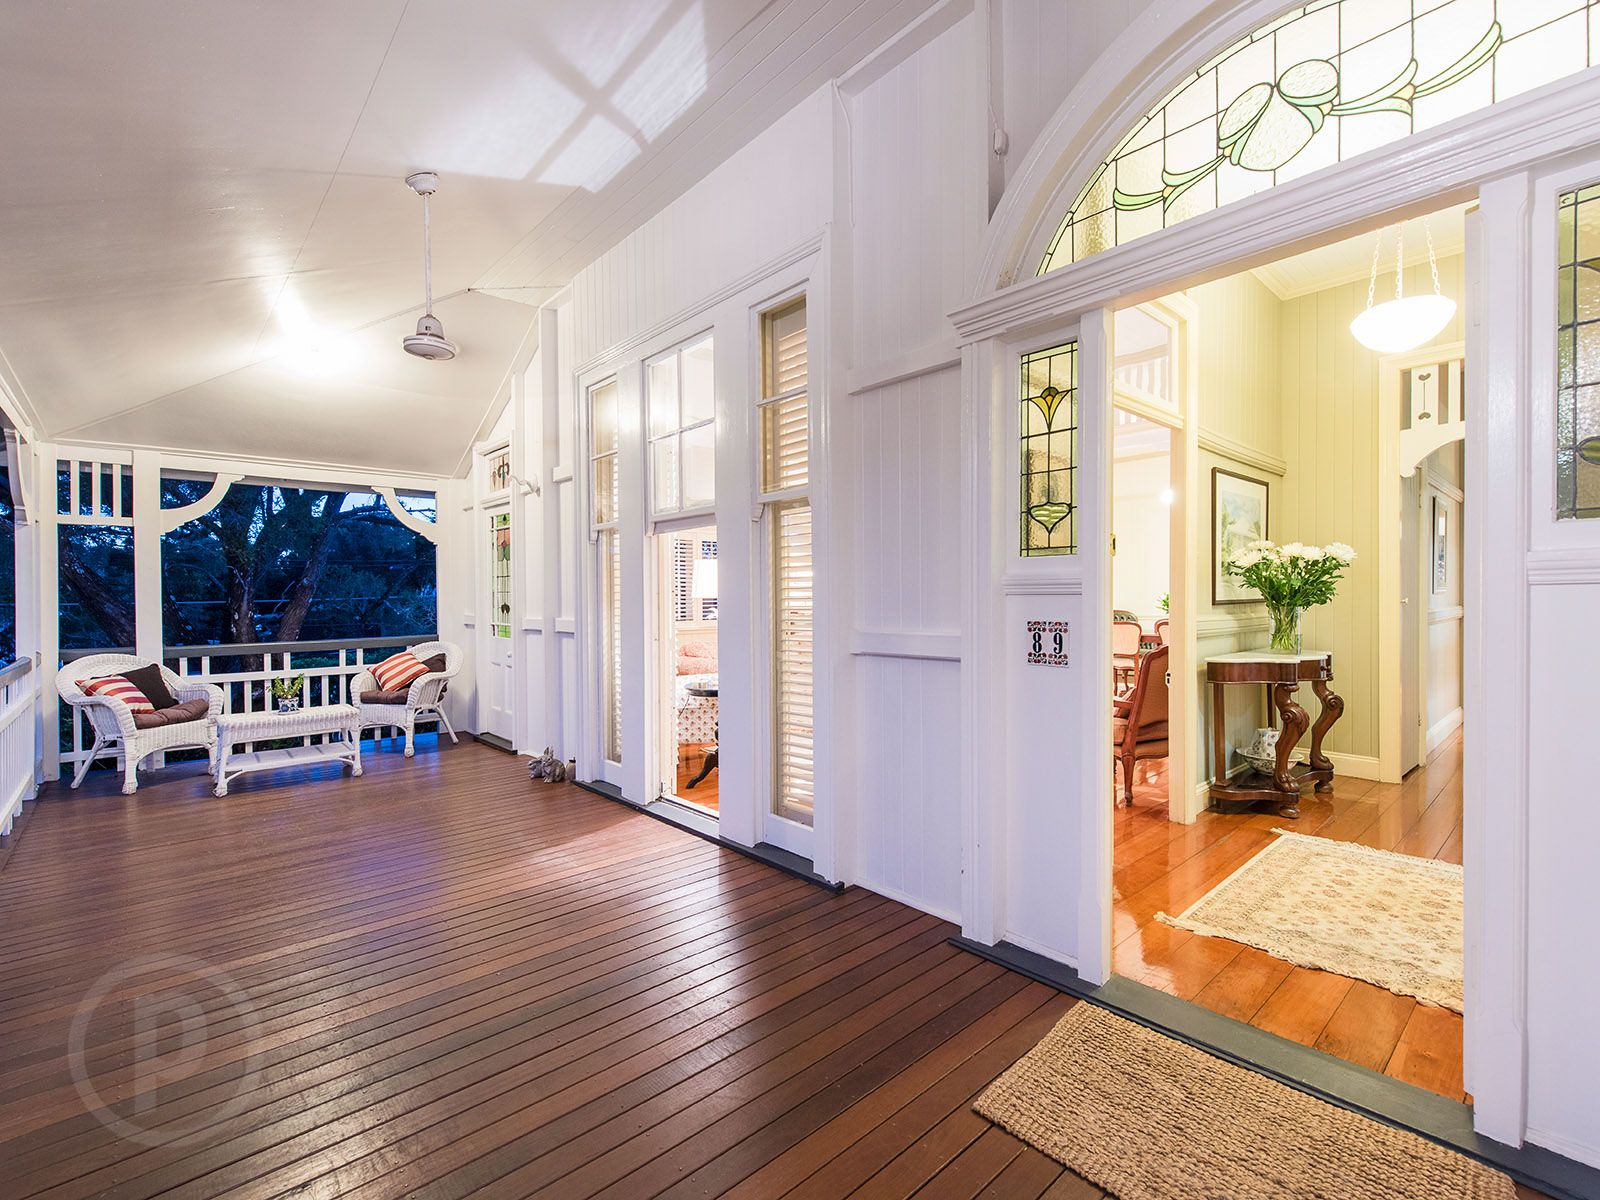 88 interior design for queenslander homes colonial for Kitchen ideas for queenslanders